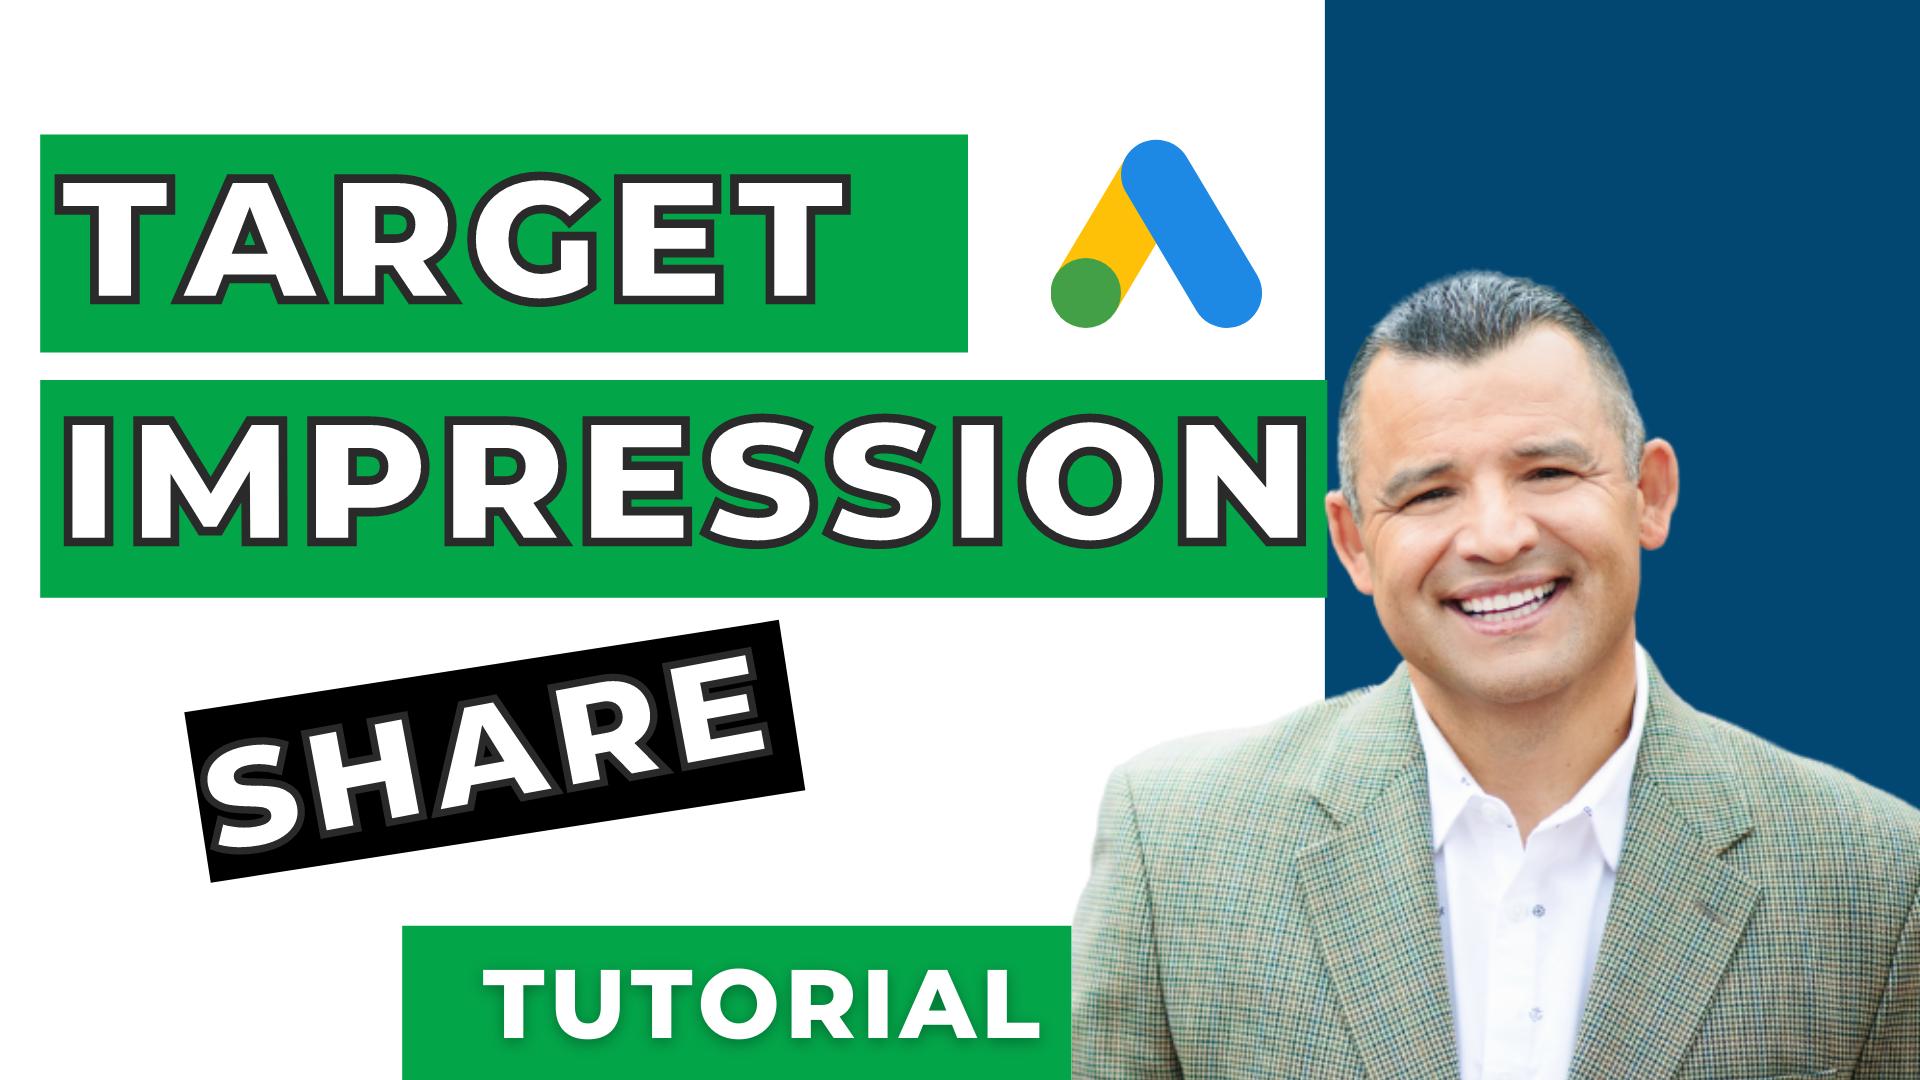 Google Ads Target Impression Share Best Practices